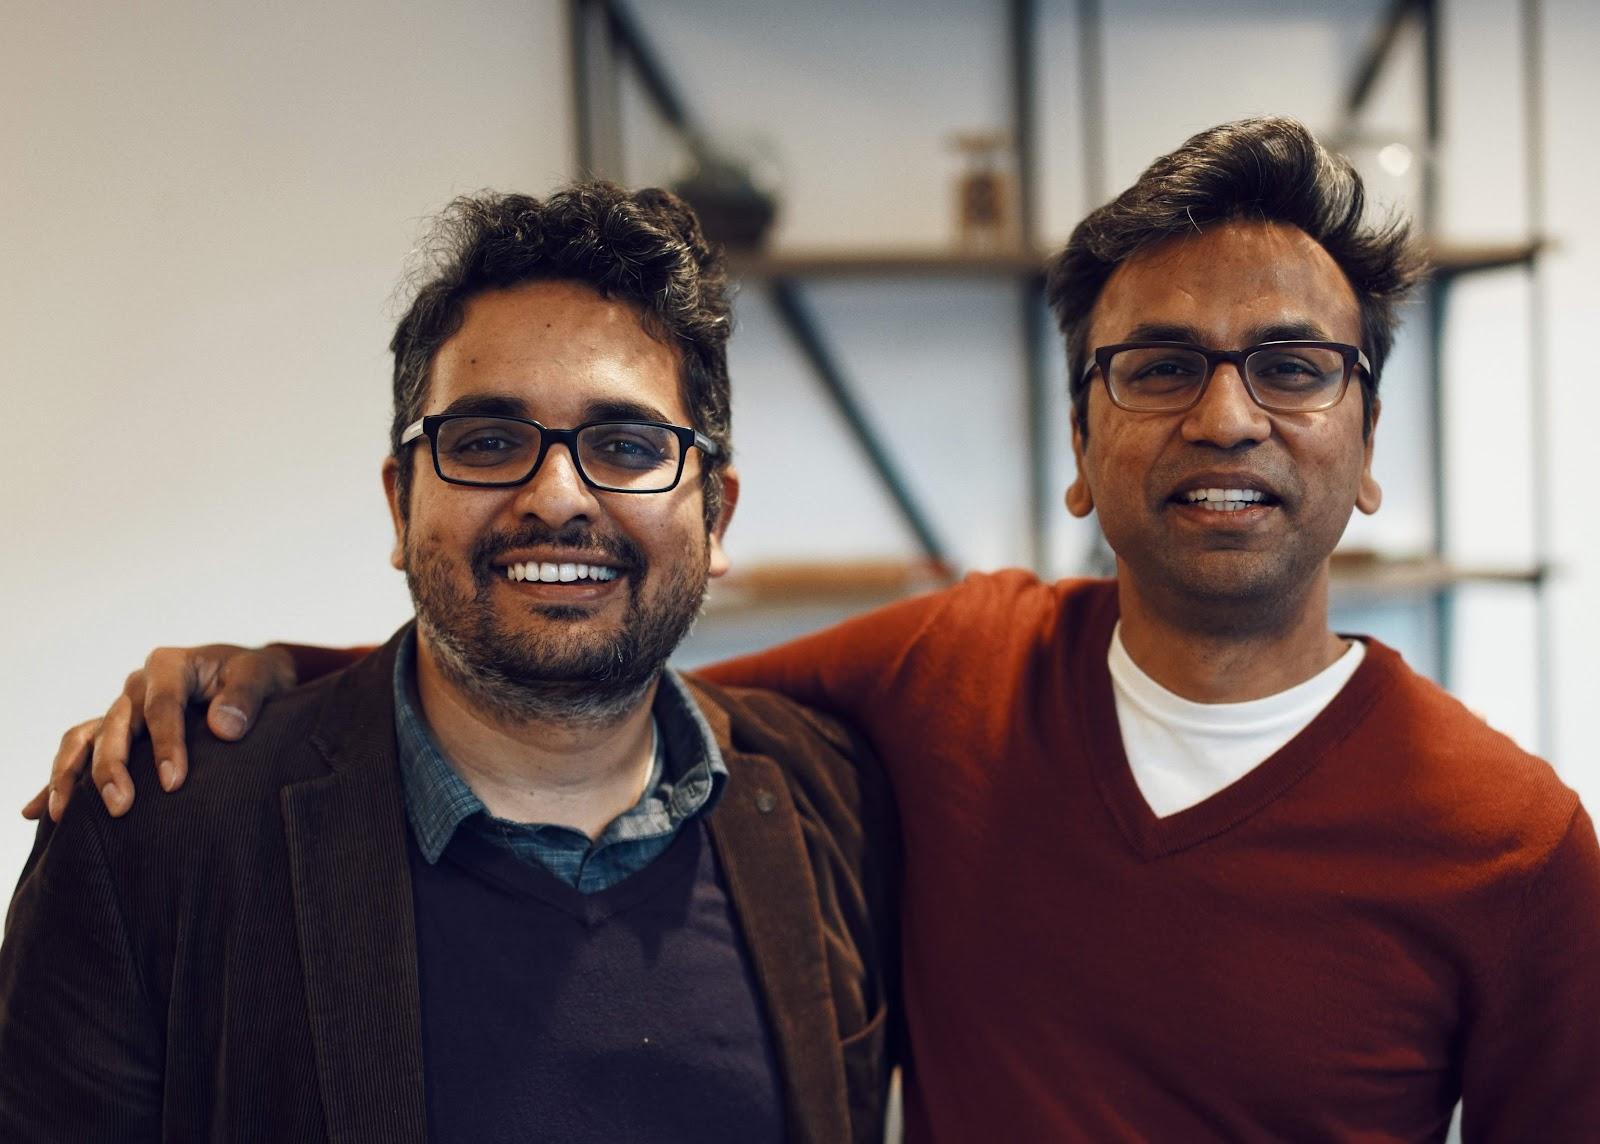 Fiddler Lab founders Amit Paka and Krishna Gade